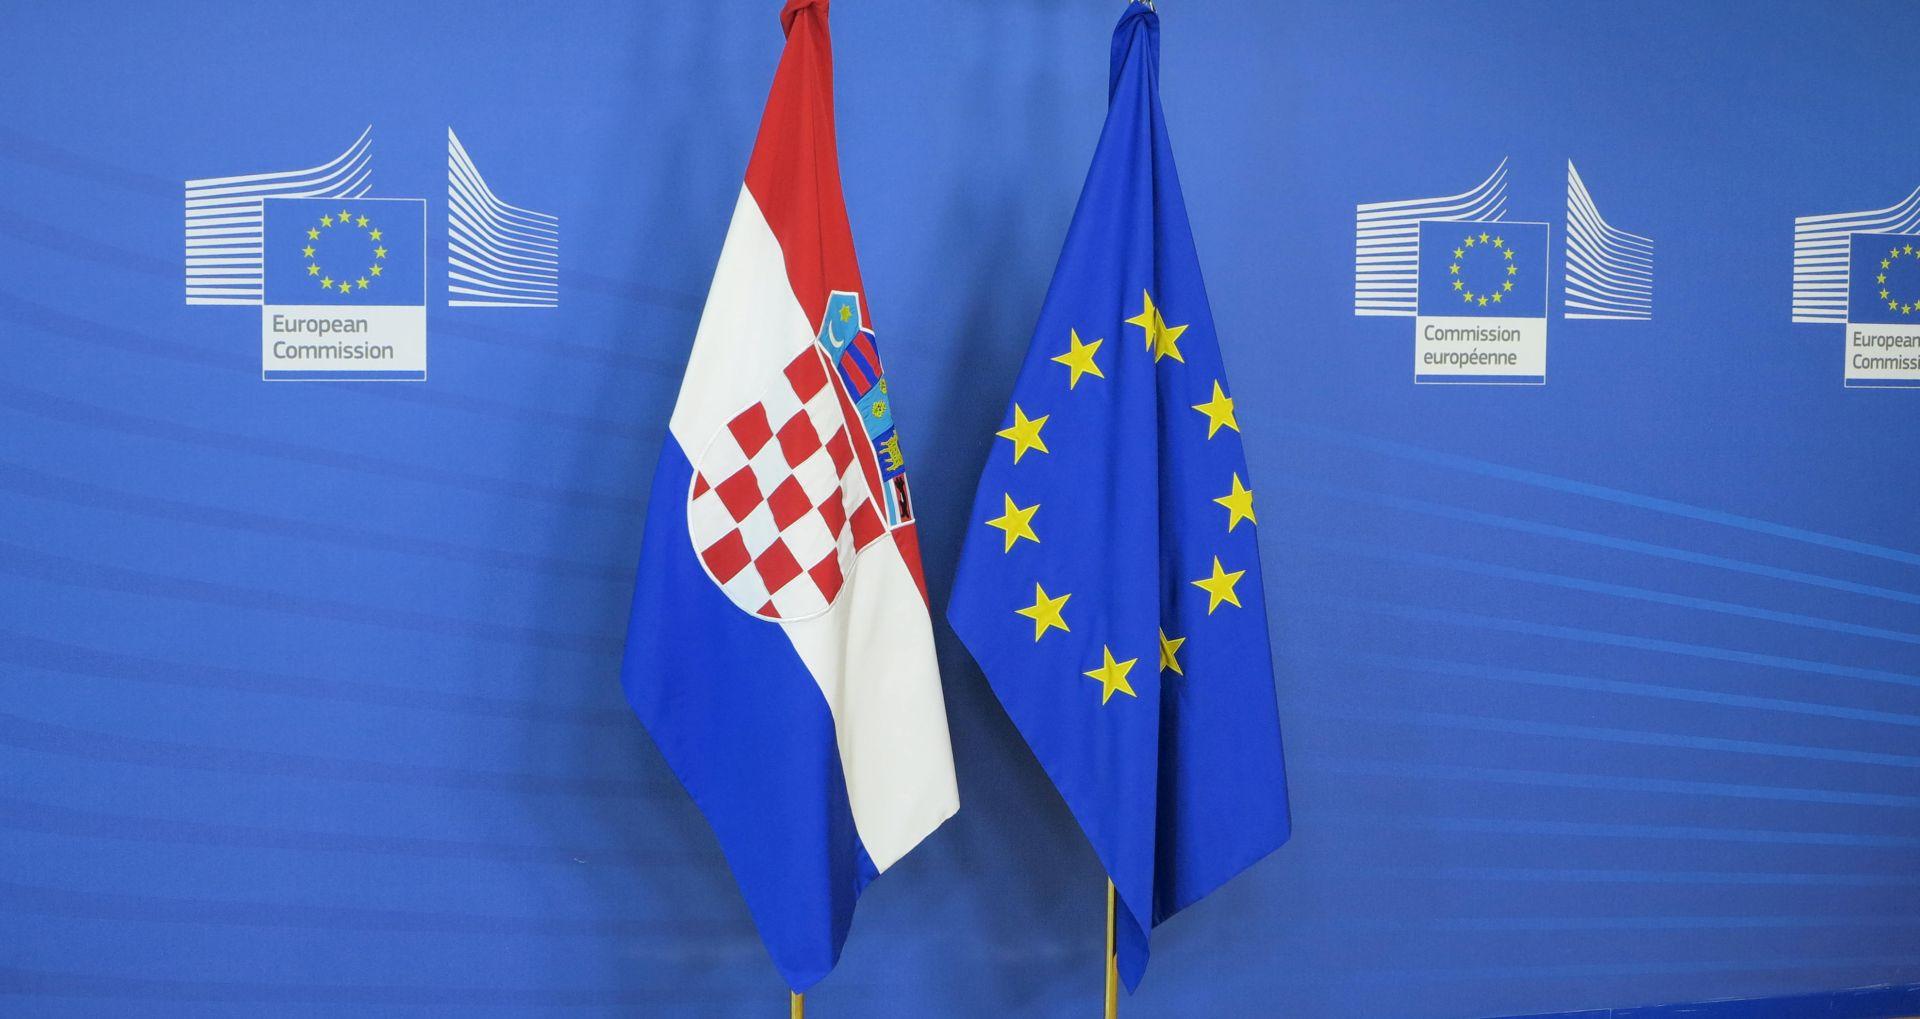 EK SLOVENIJI I MAĐARSKOJ: Odblokirajte Hrvatsku, spremna je za pregovore o OECD